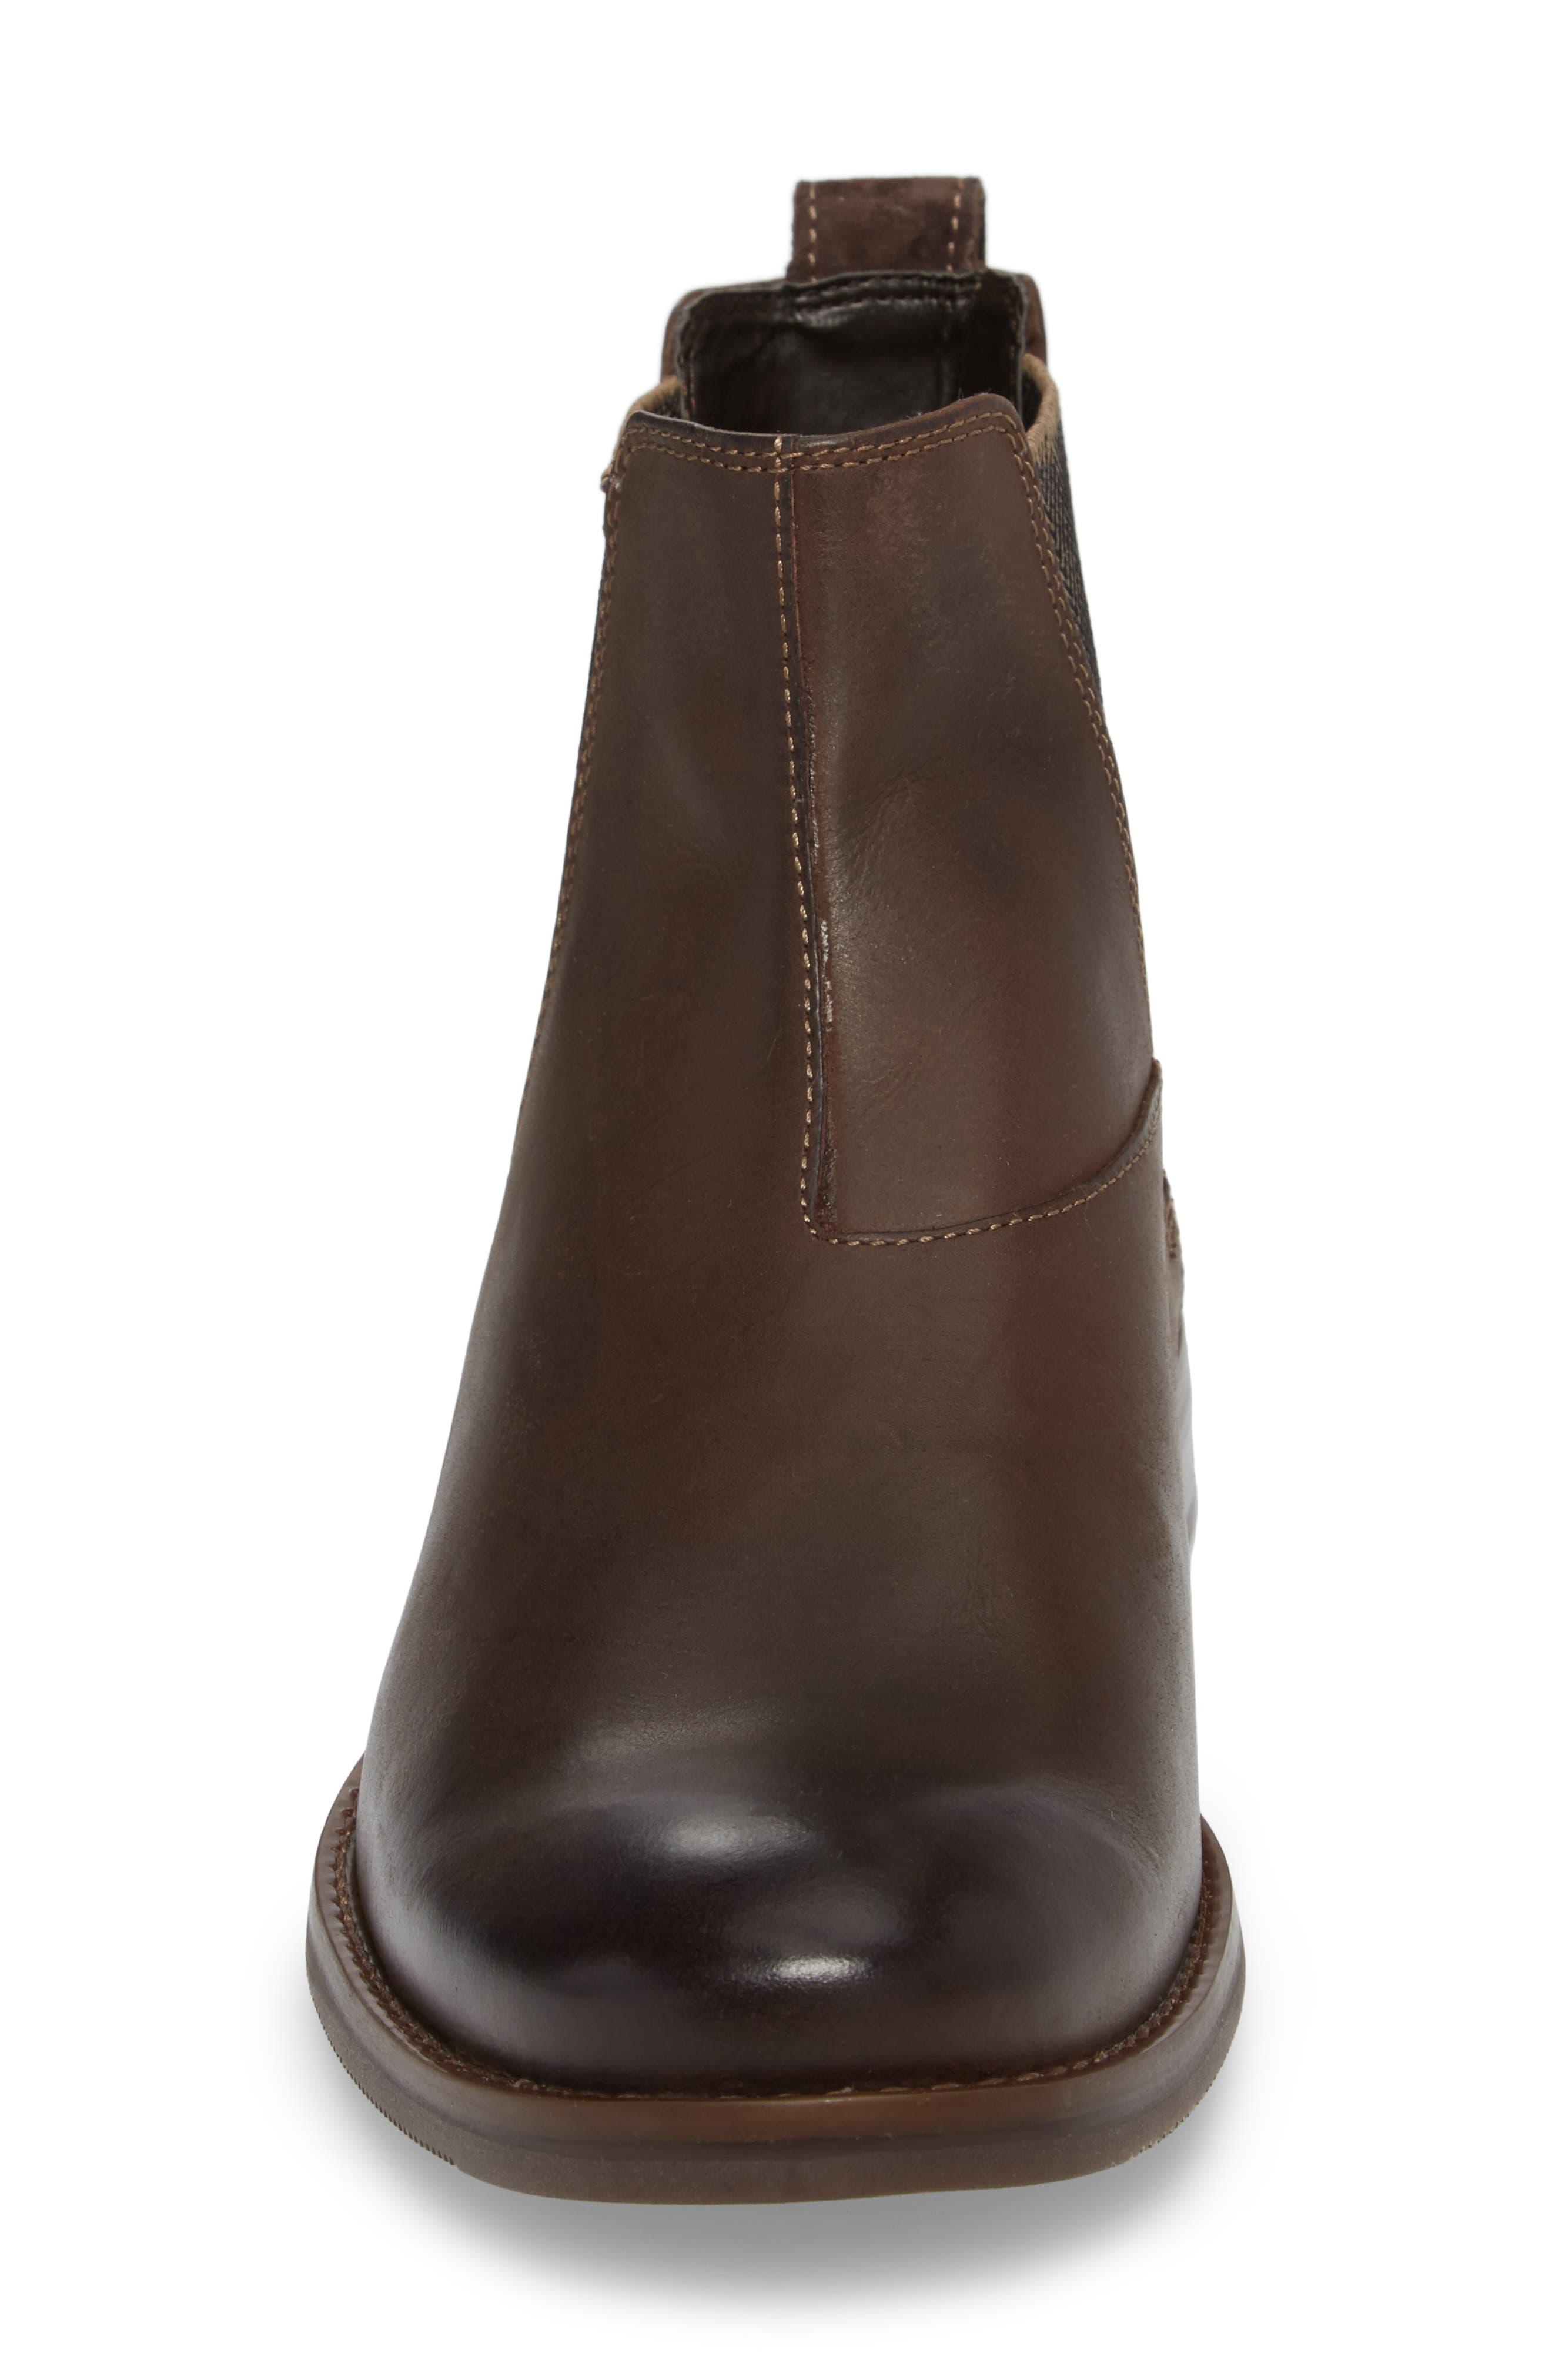 Wynstin Chelsea Boot,                             Alternate thumbnail 4, color,                             Dark Bitter Chocolate Leather